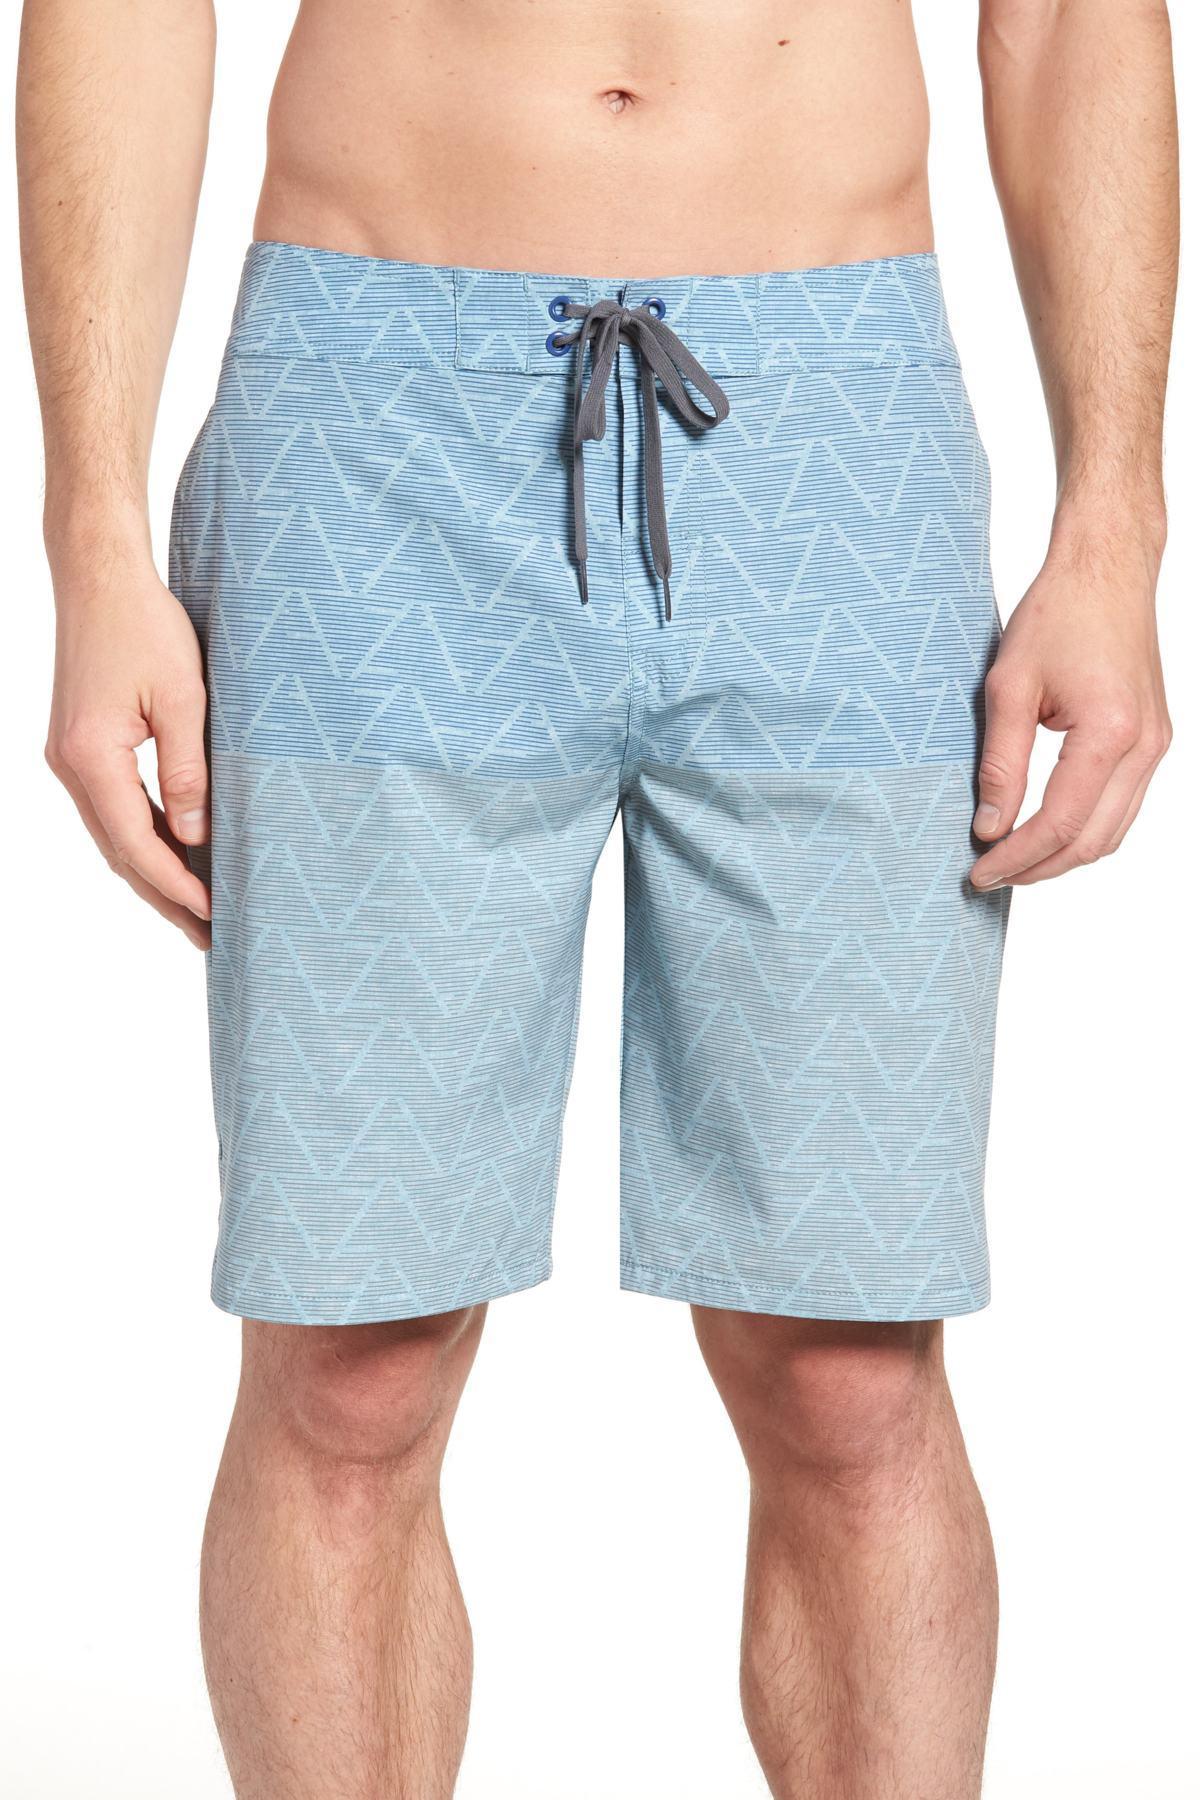 8845d508e4 Travis Mathew Teepees Swim Trunks in Blue for Men - Lyst